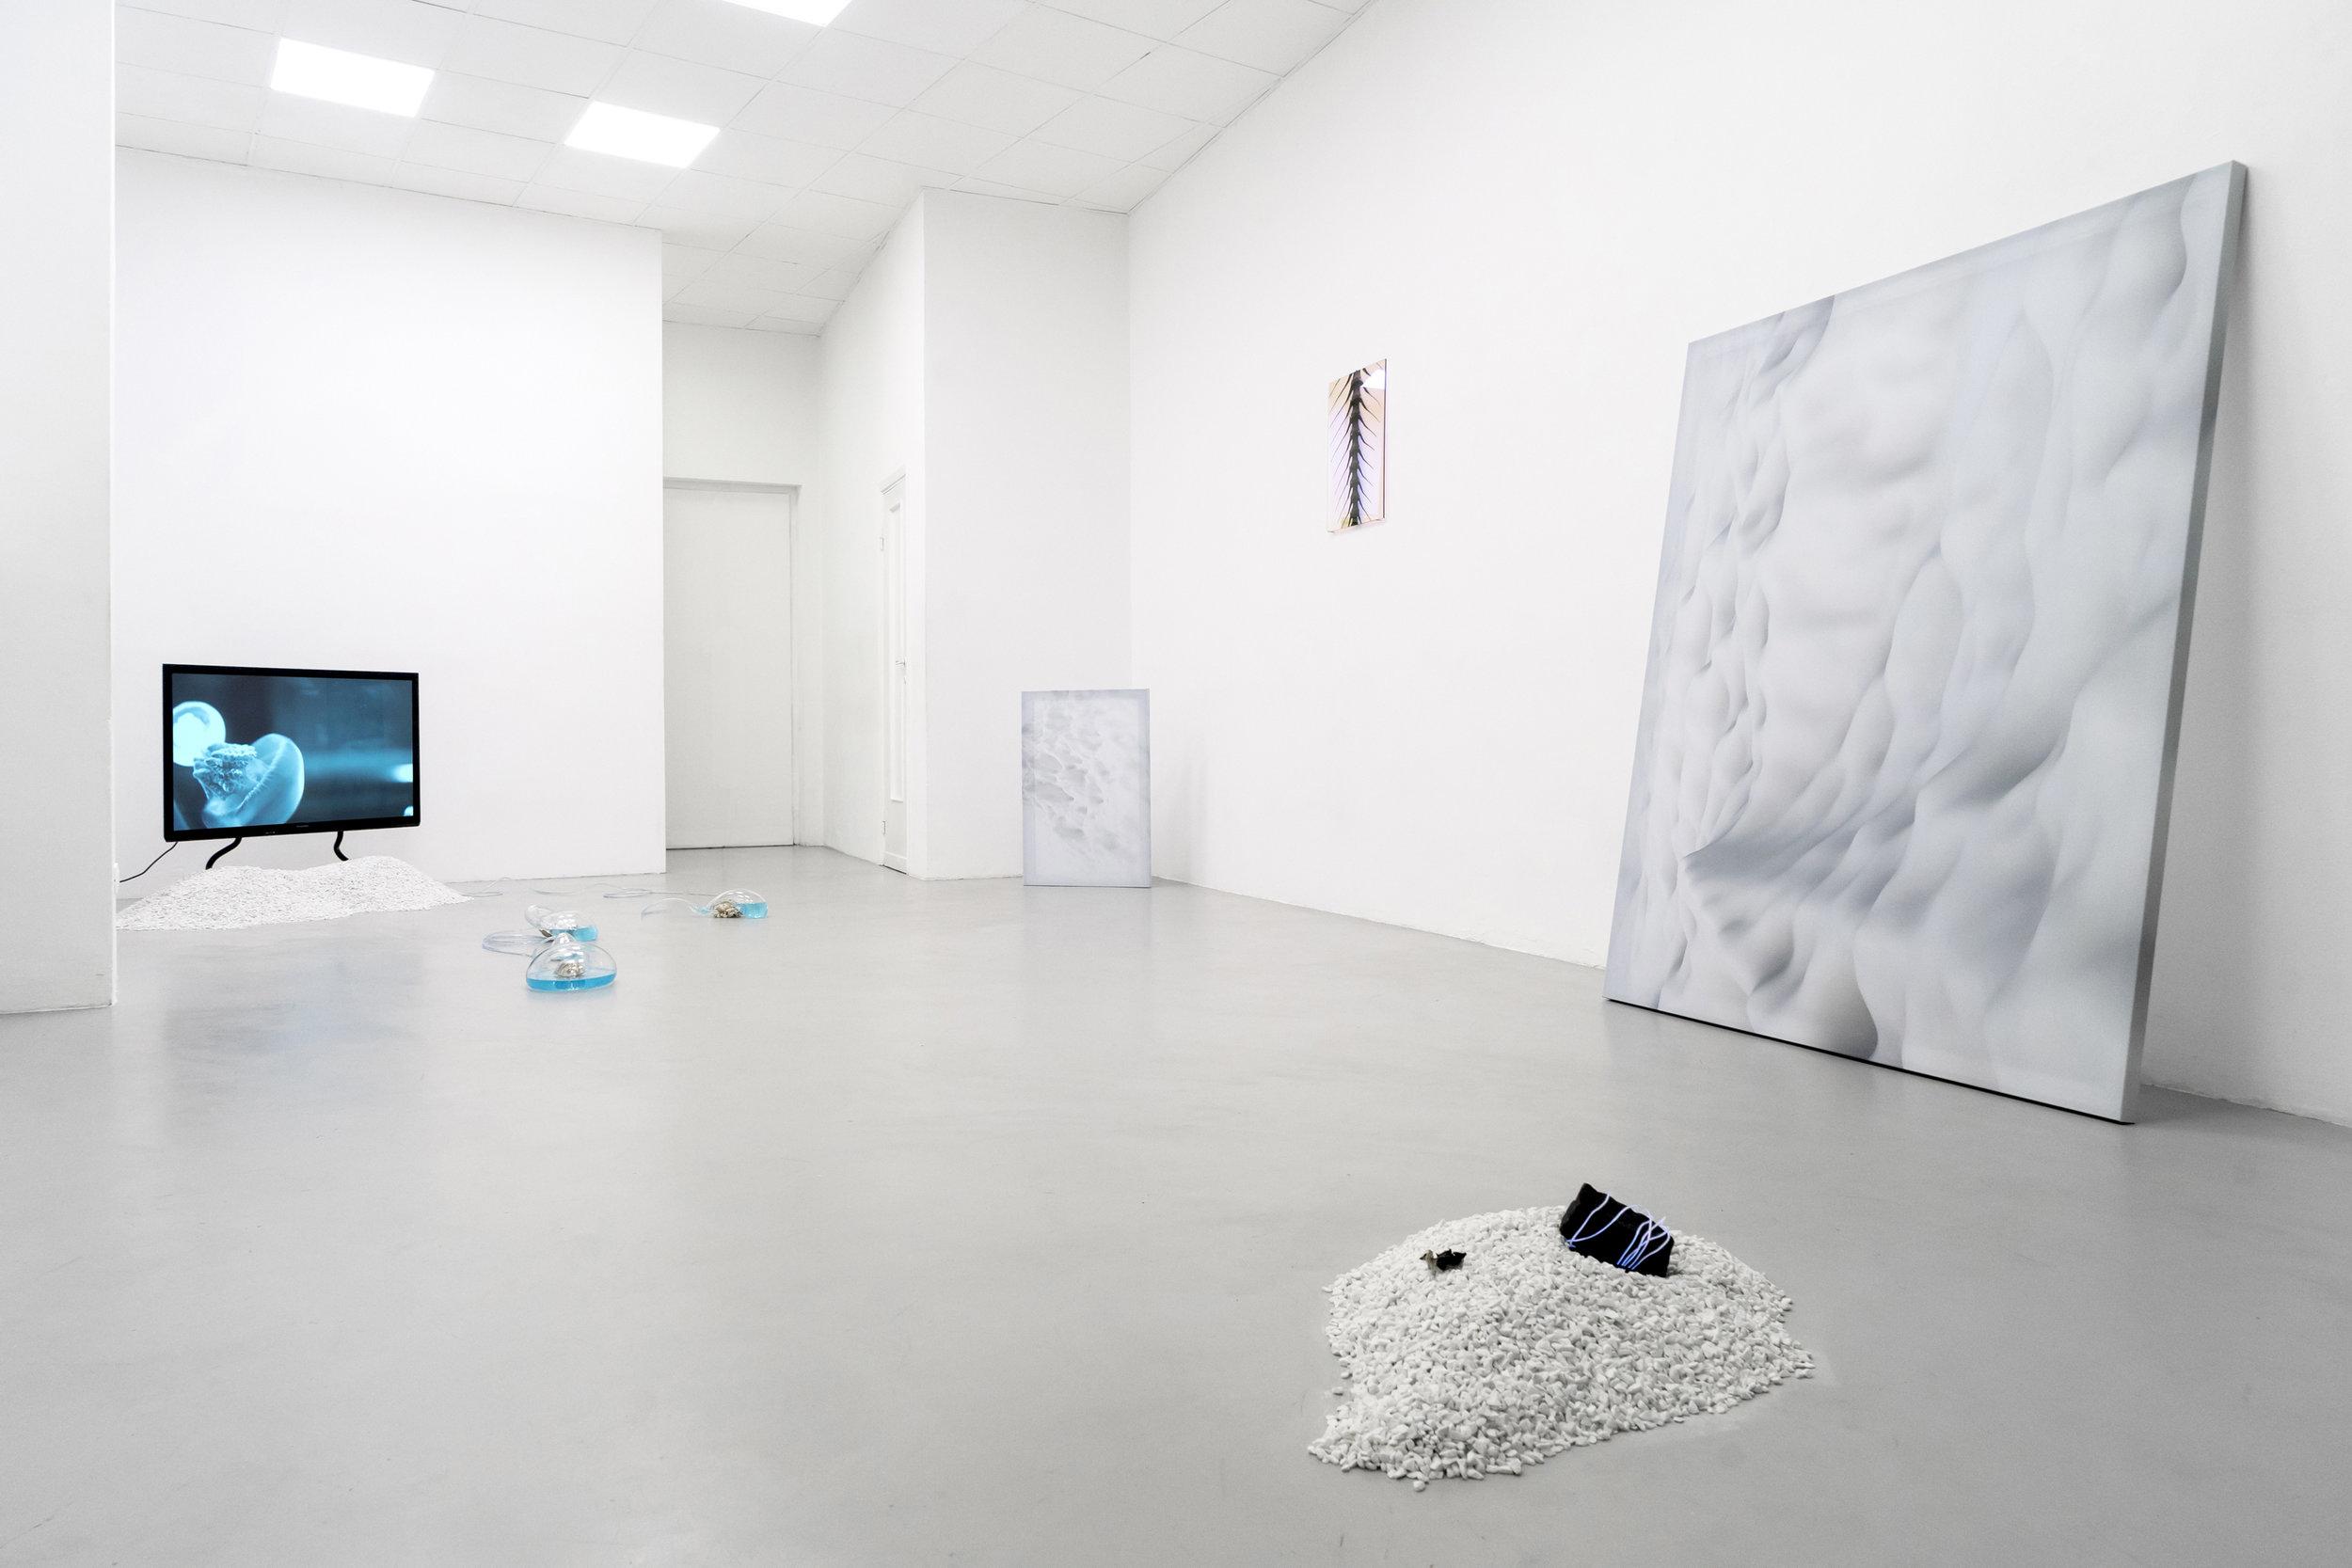 1 Paulo Arraiano, Sensorial Divinities. 2019. Exhibition view. Dimora Artica (ph Cesare Lopopolo).jpg